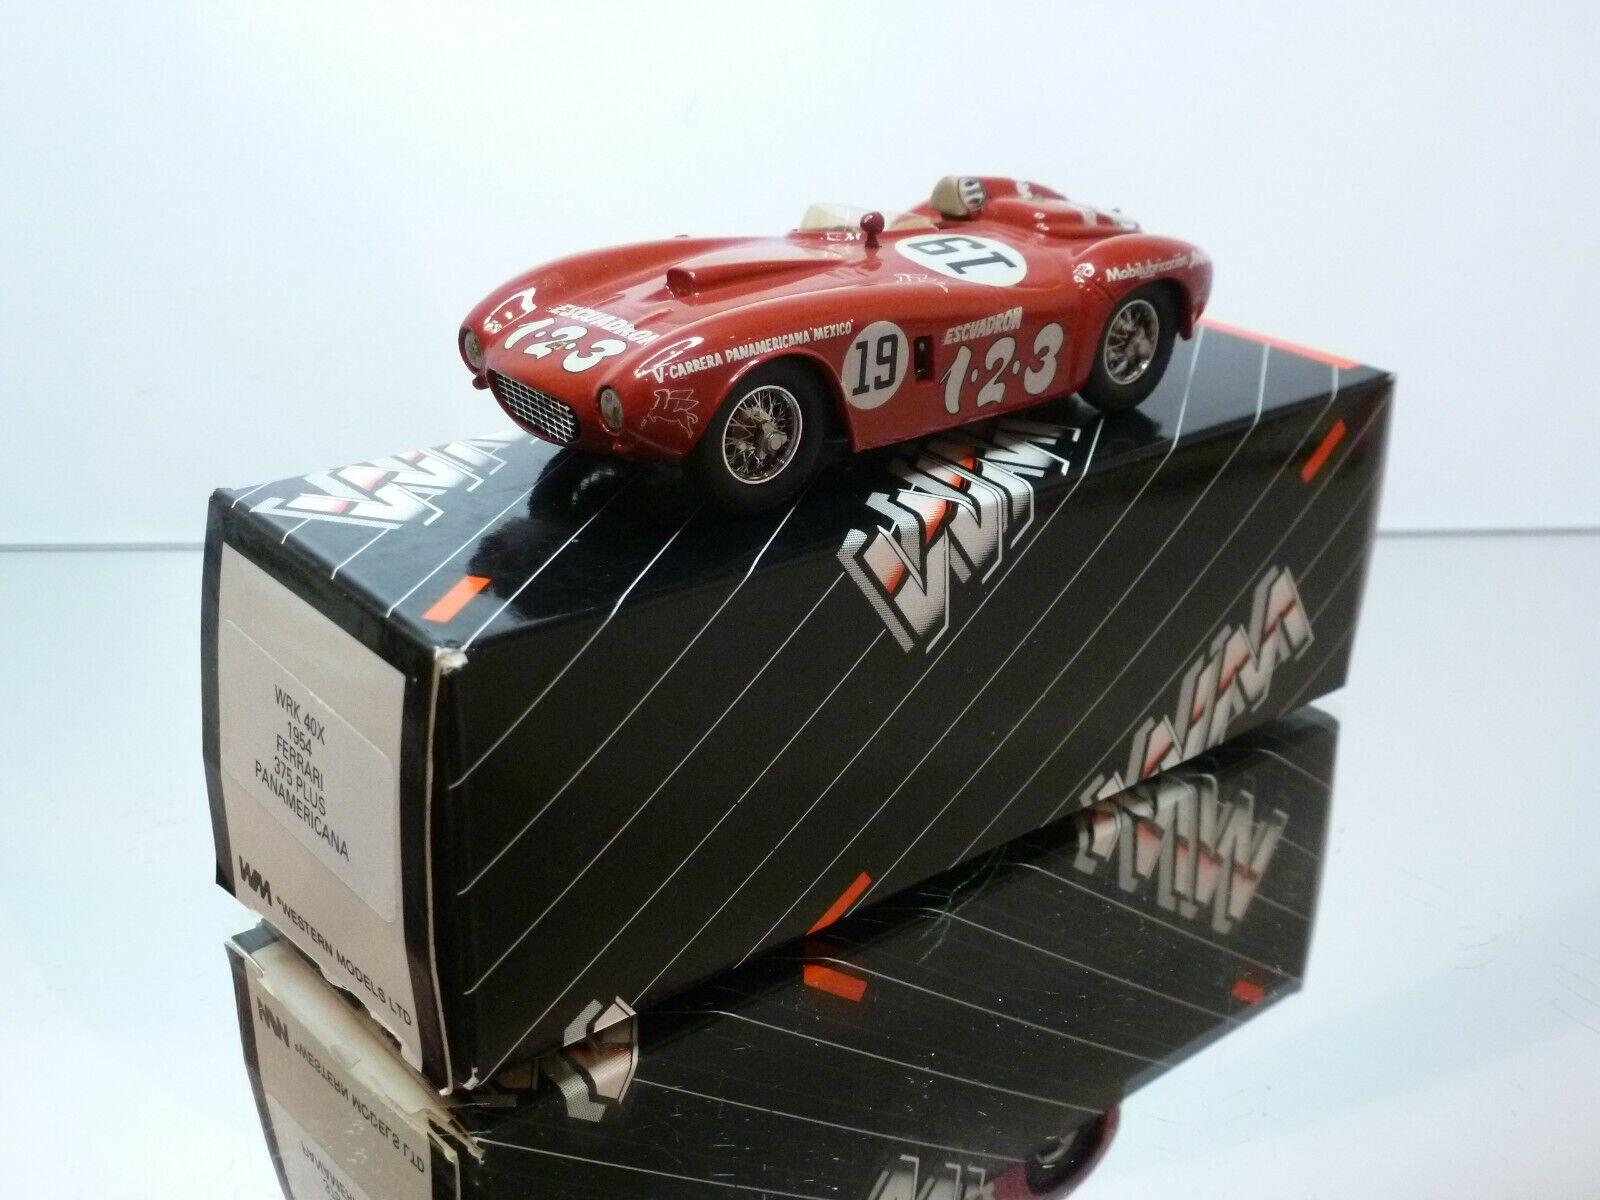 WESTERN MODELS WRK40X FERRARI 375 PLUS PANAMERICA - rojo 1 43 - EXCELLENT IN BOX